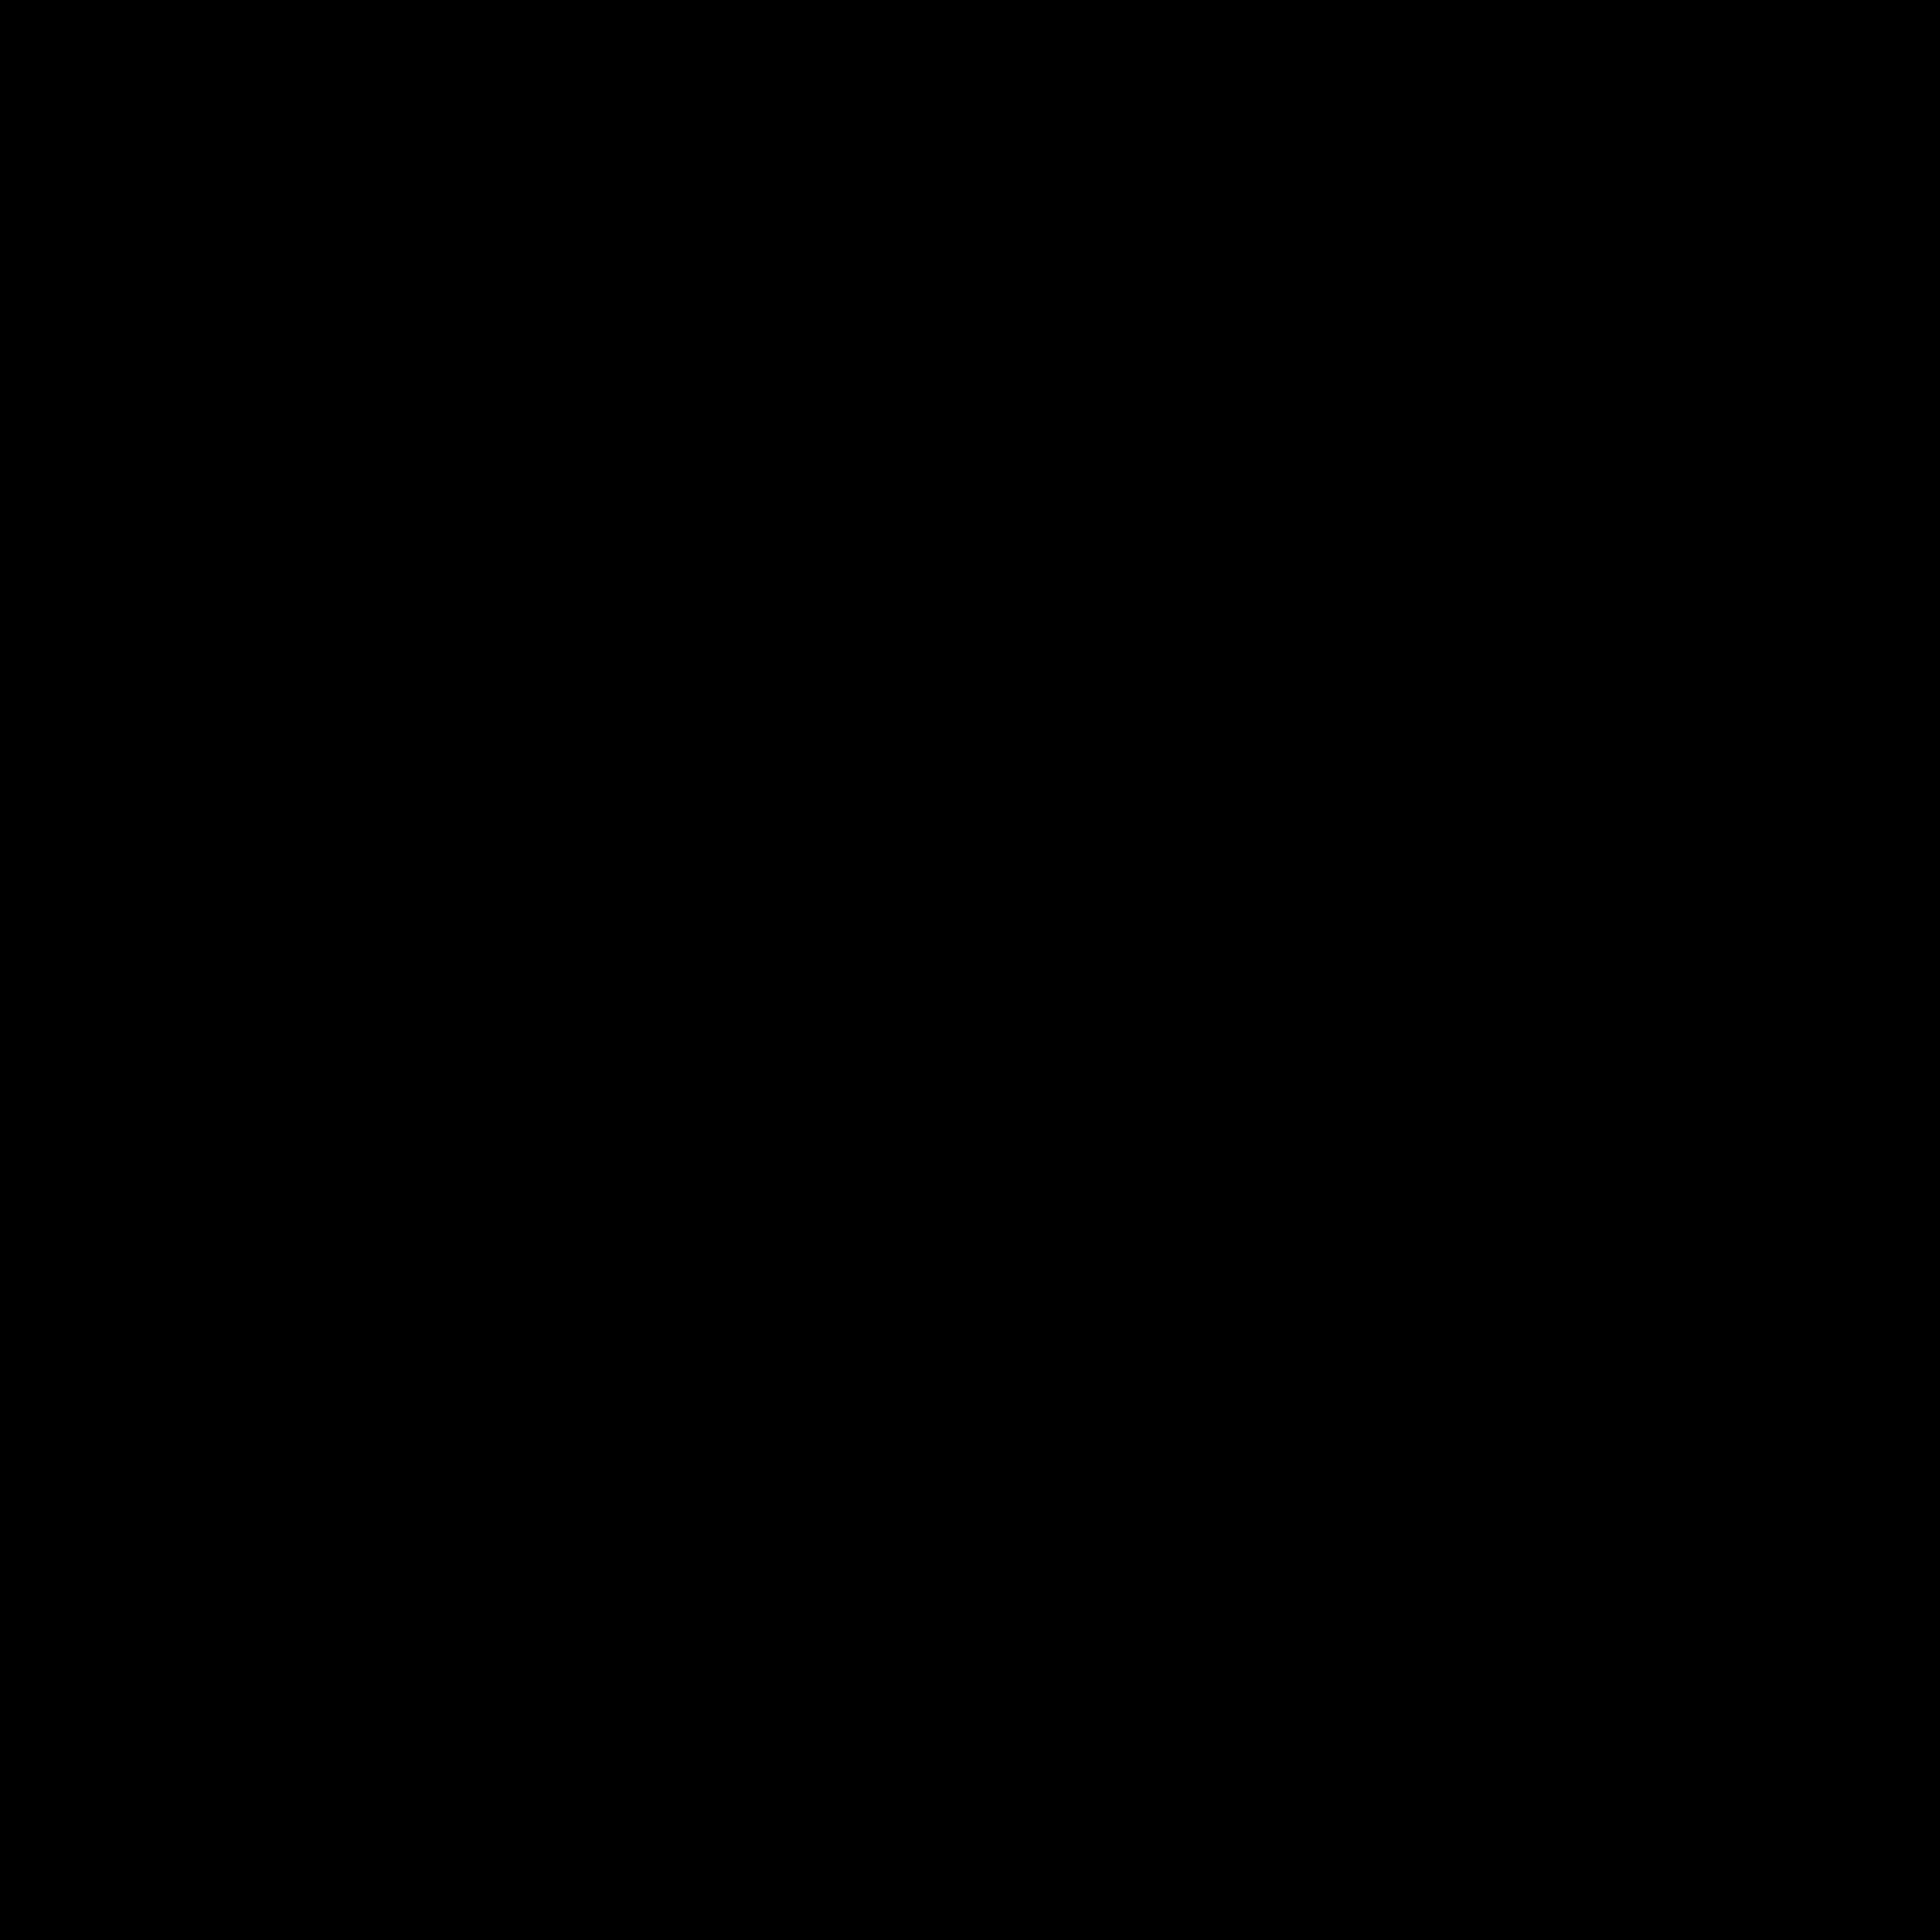 Sergio Tacchini Logo PNG Transparent & SVG Vector.